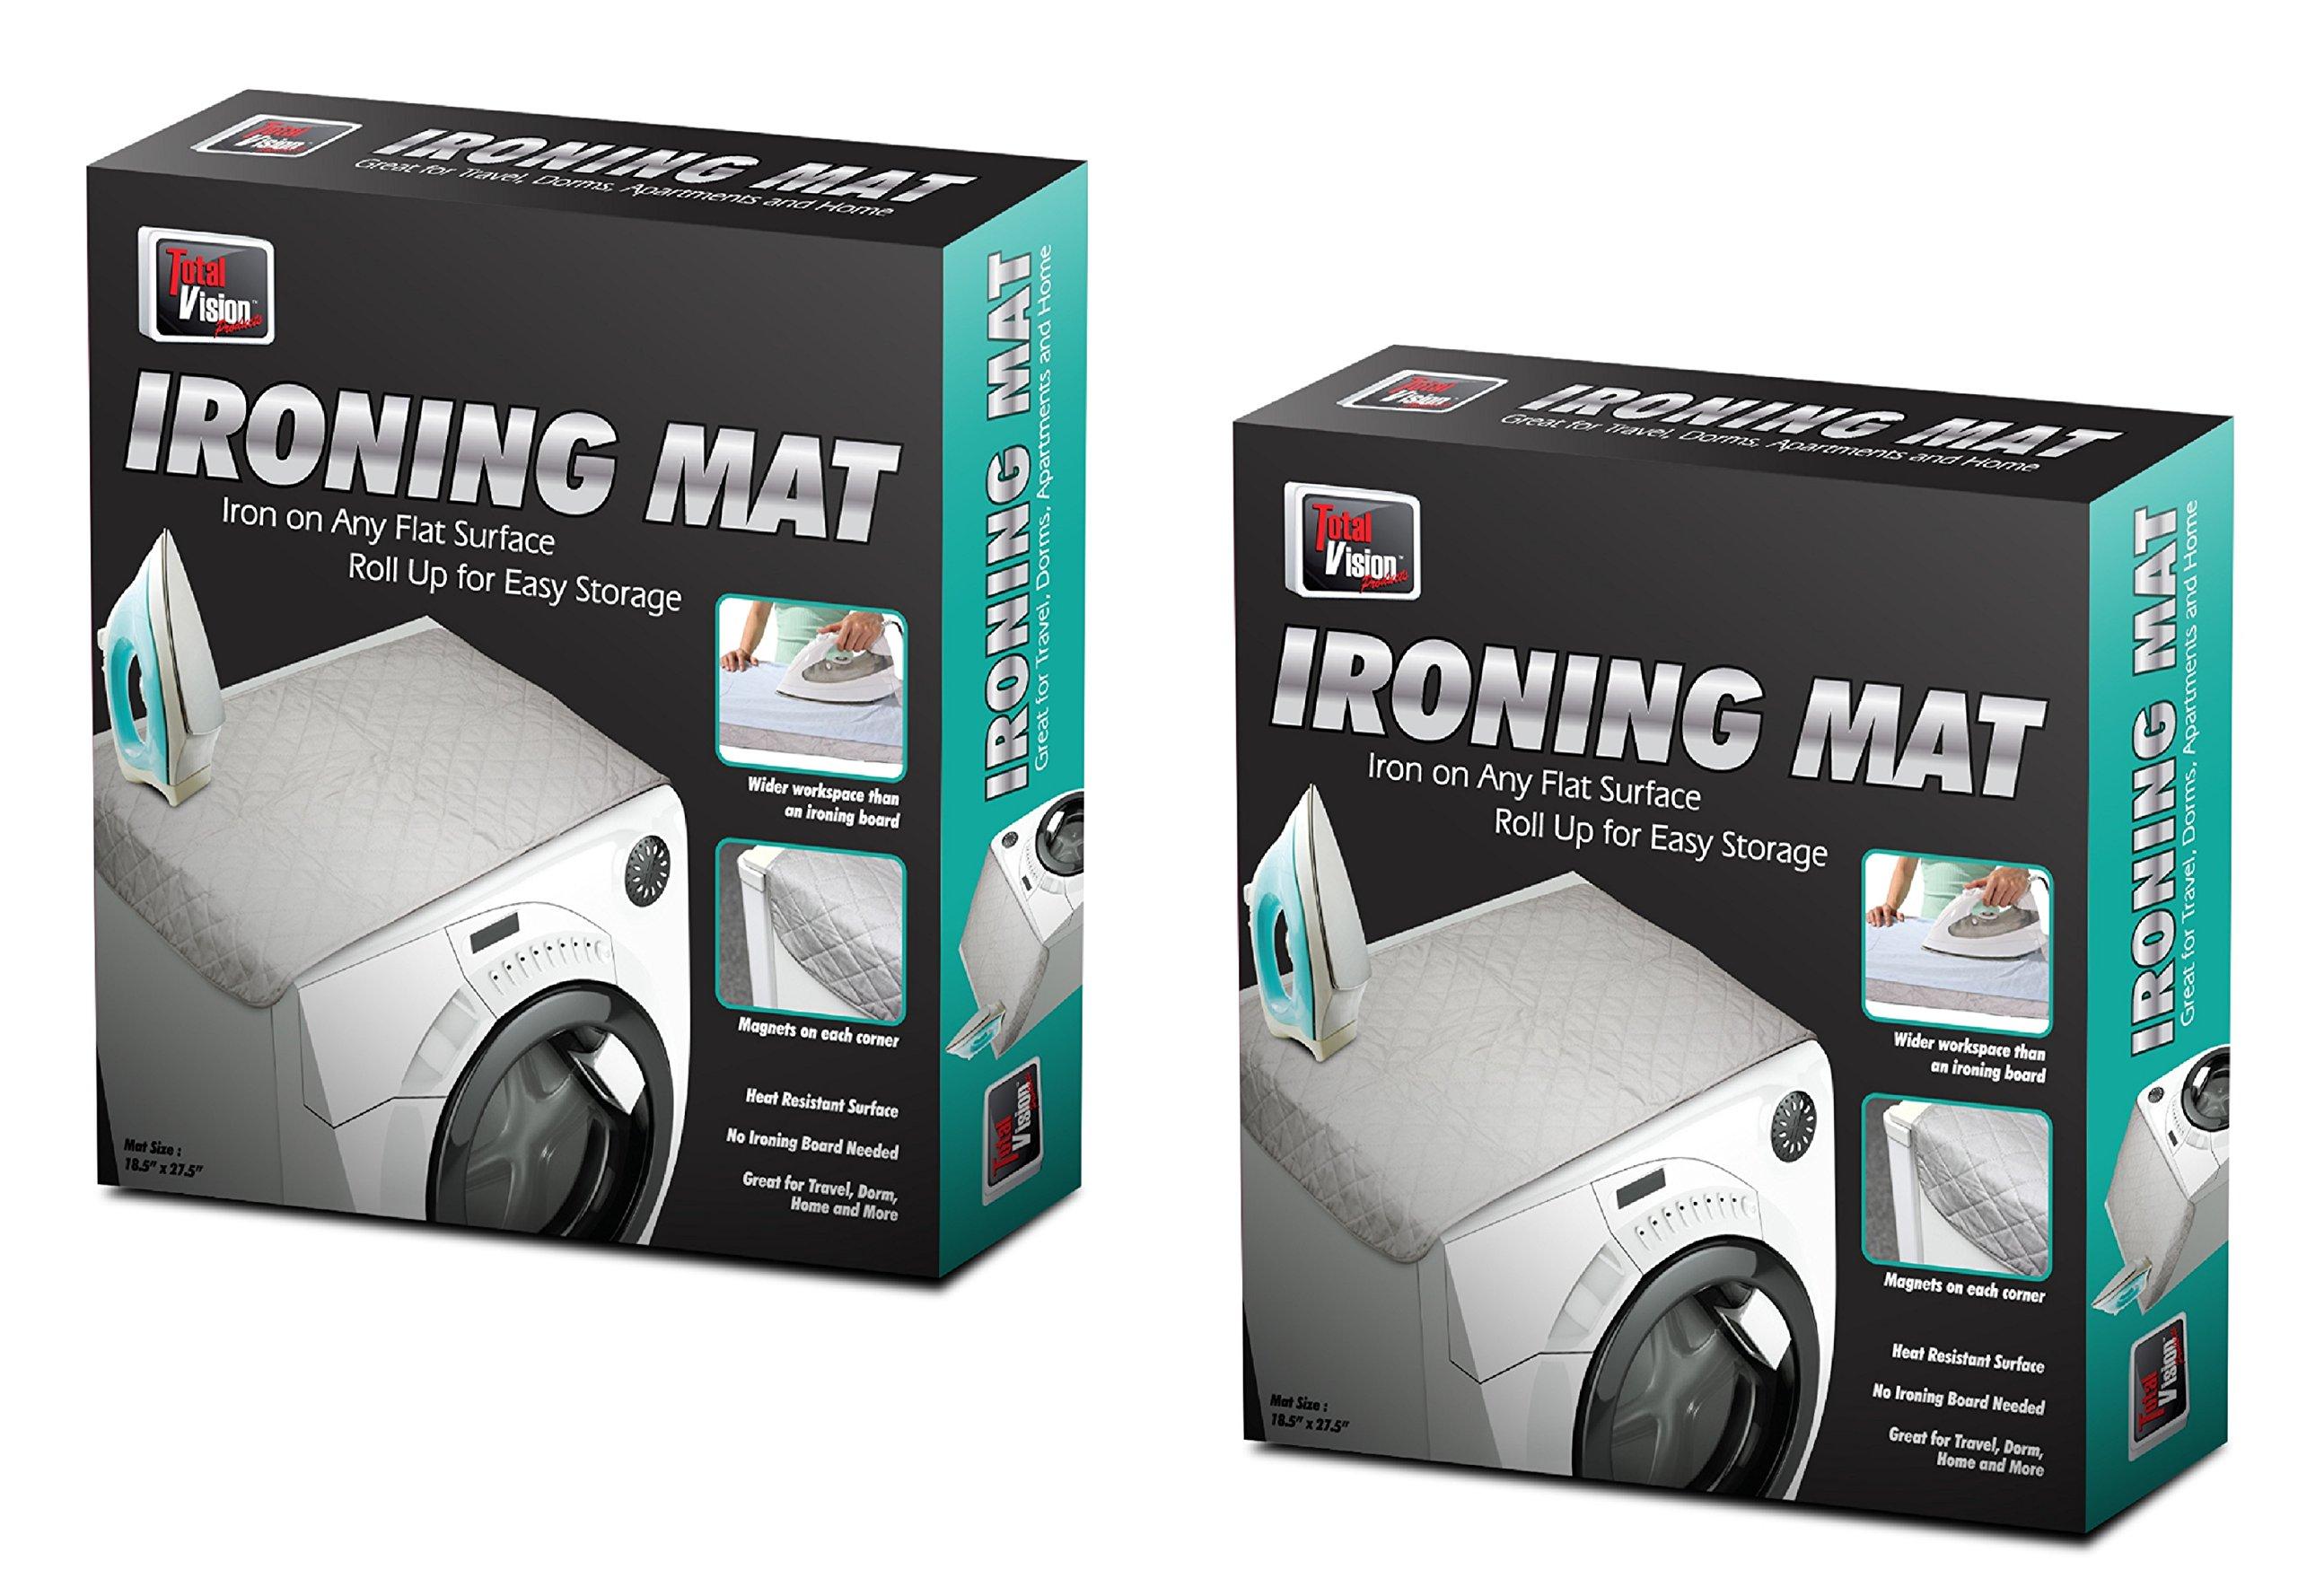 2 PACK Portable Flat Magnetic Heat Ironing Mat